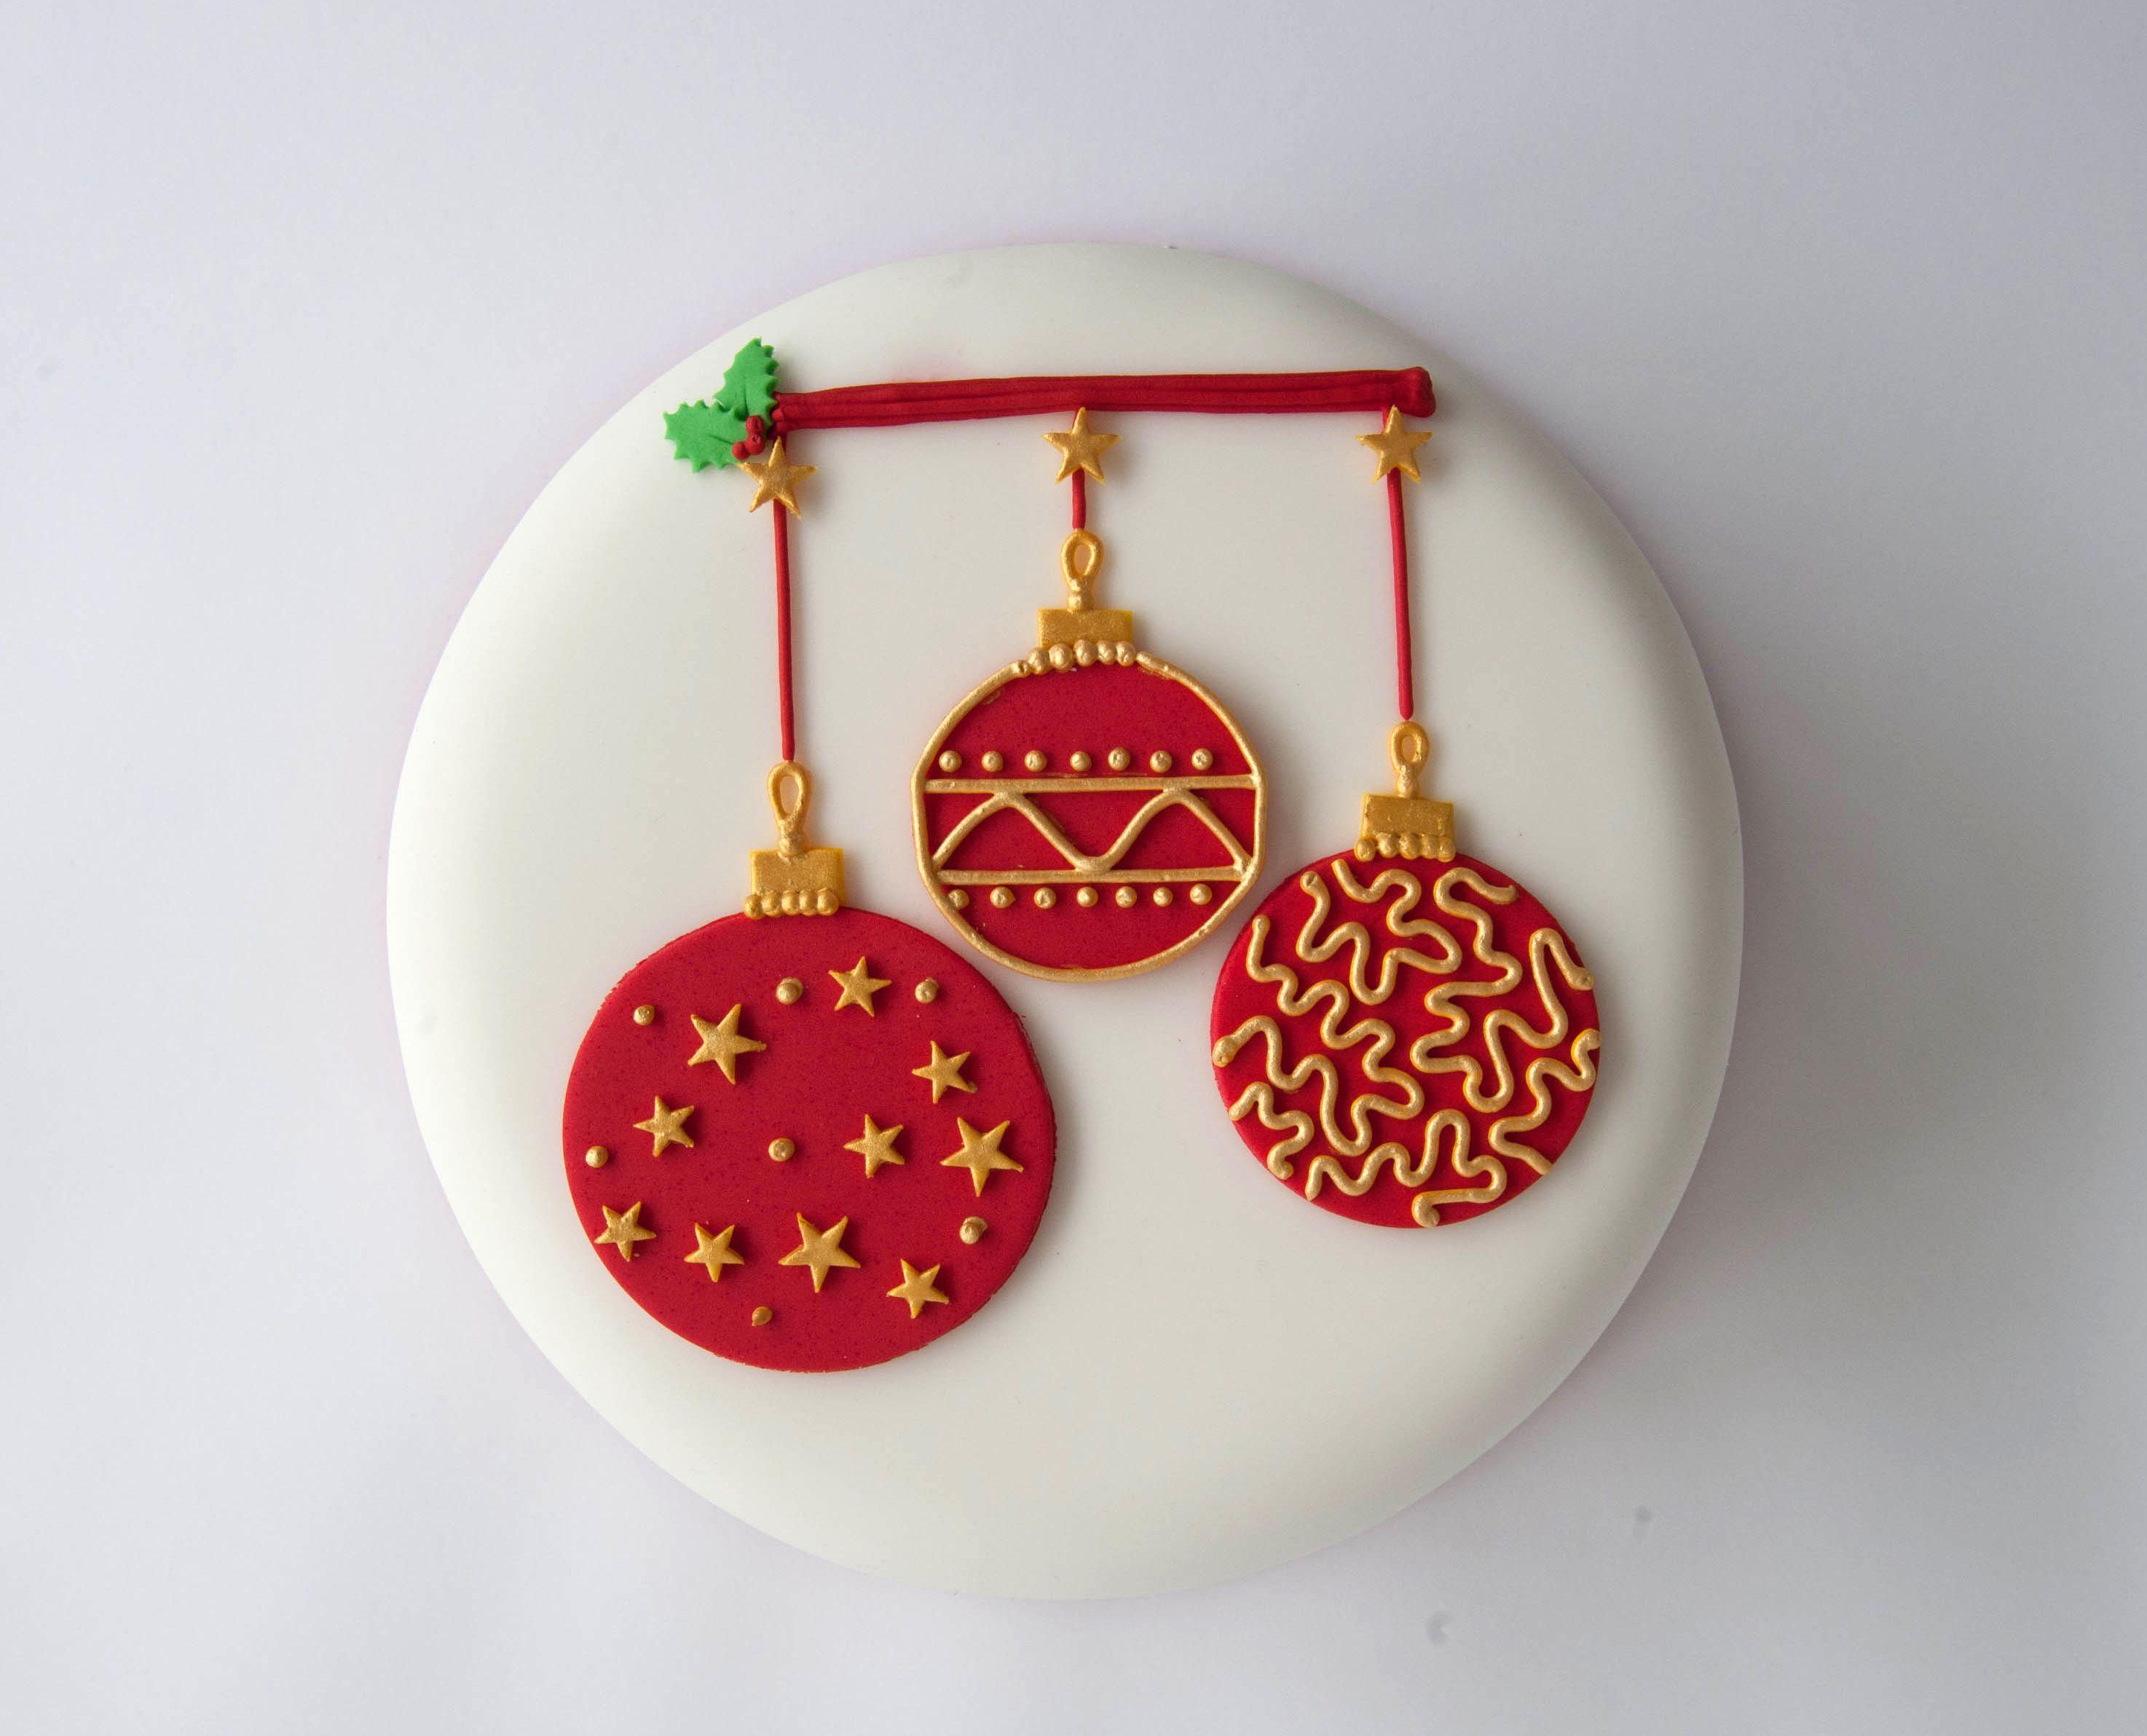 Day 1 Christmas Cake Decorating Decorating, Tutorials